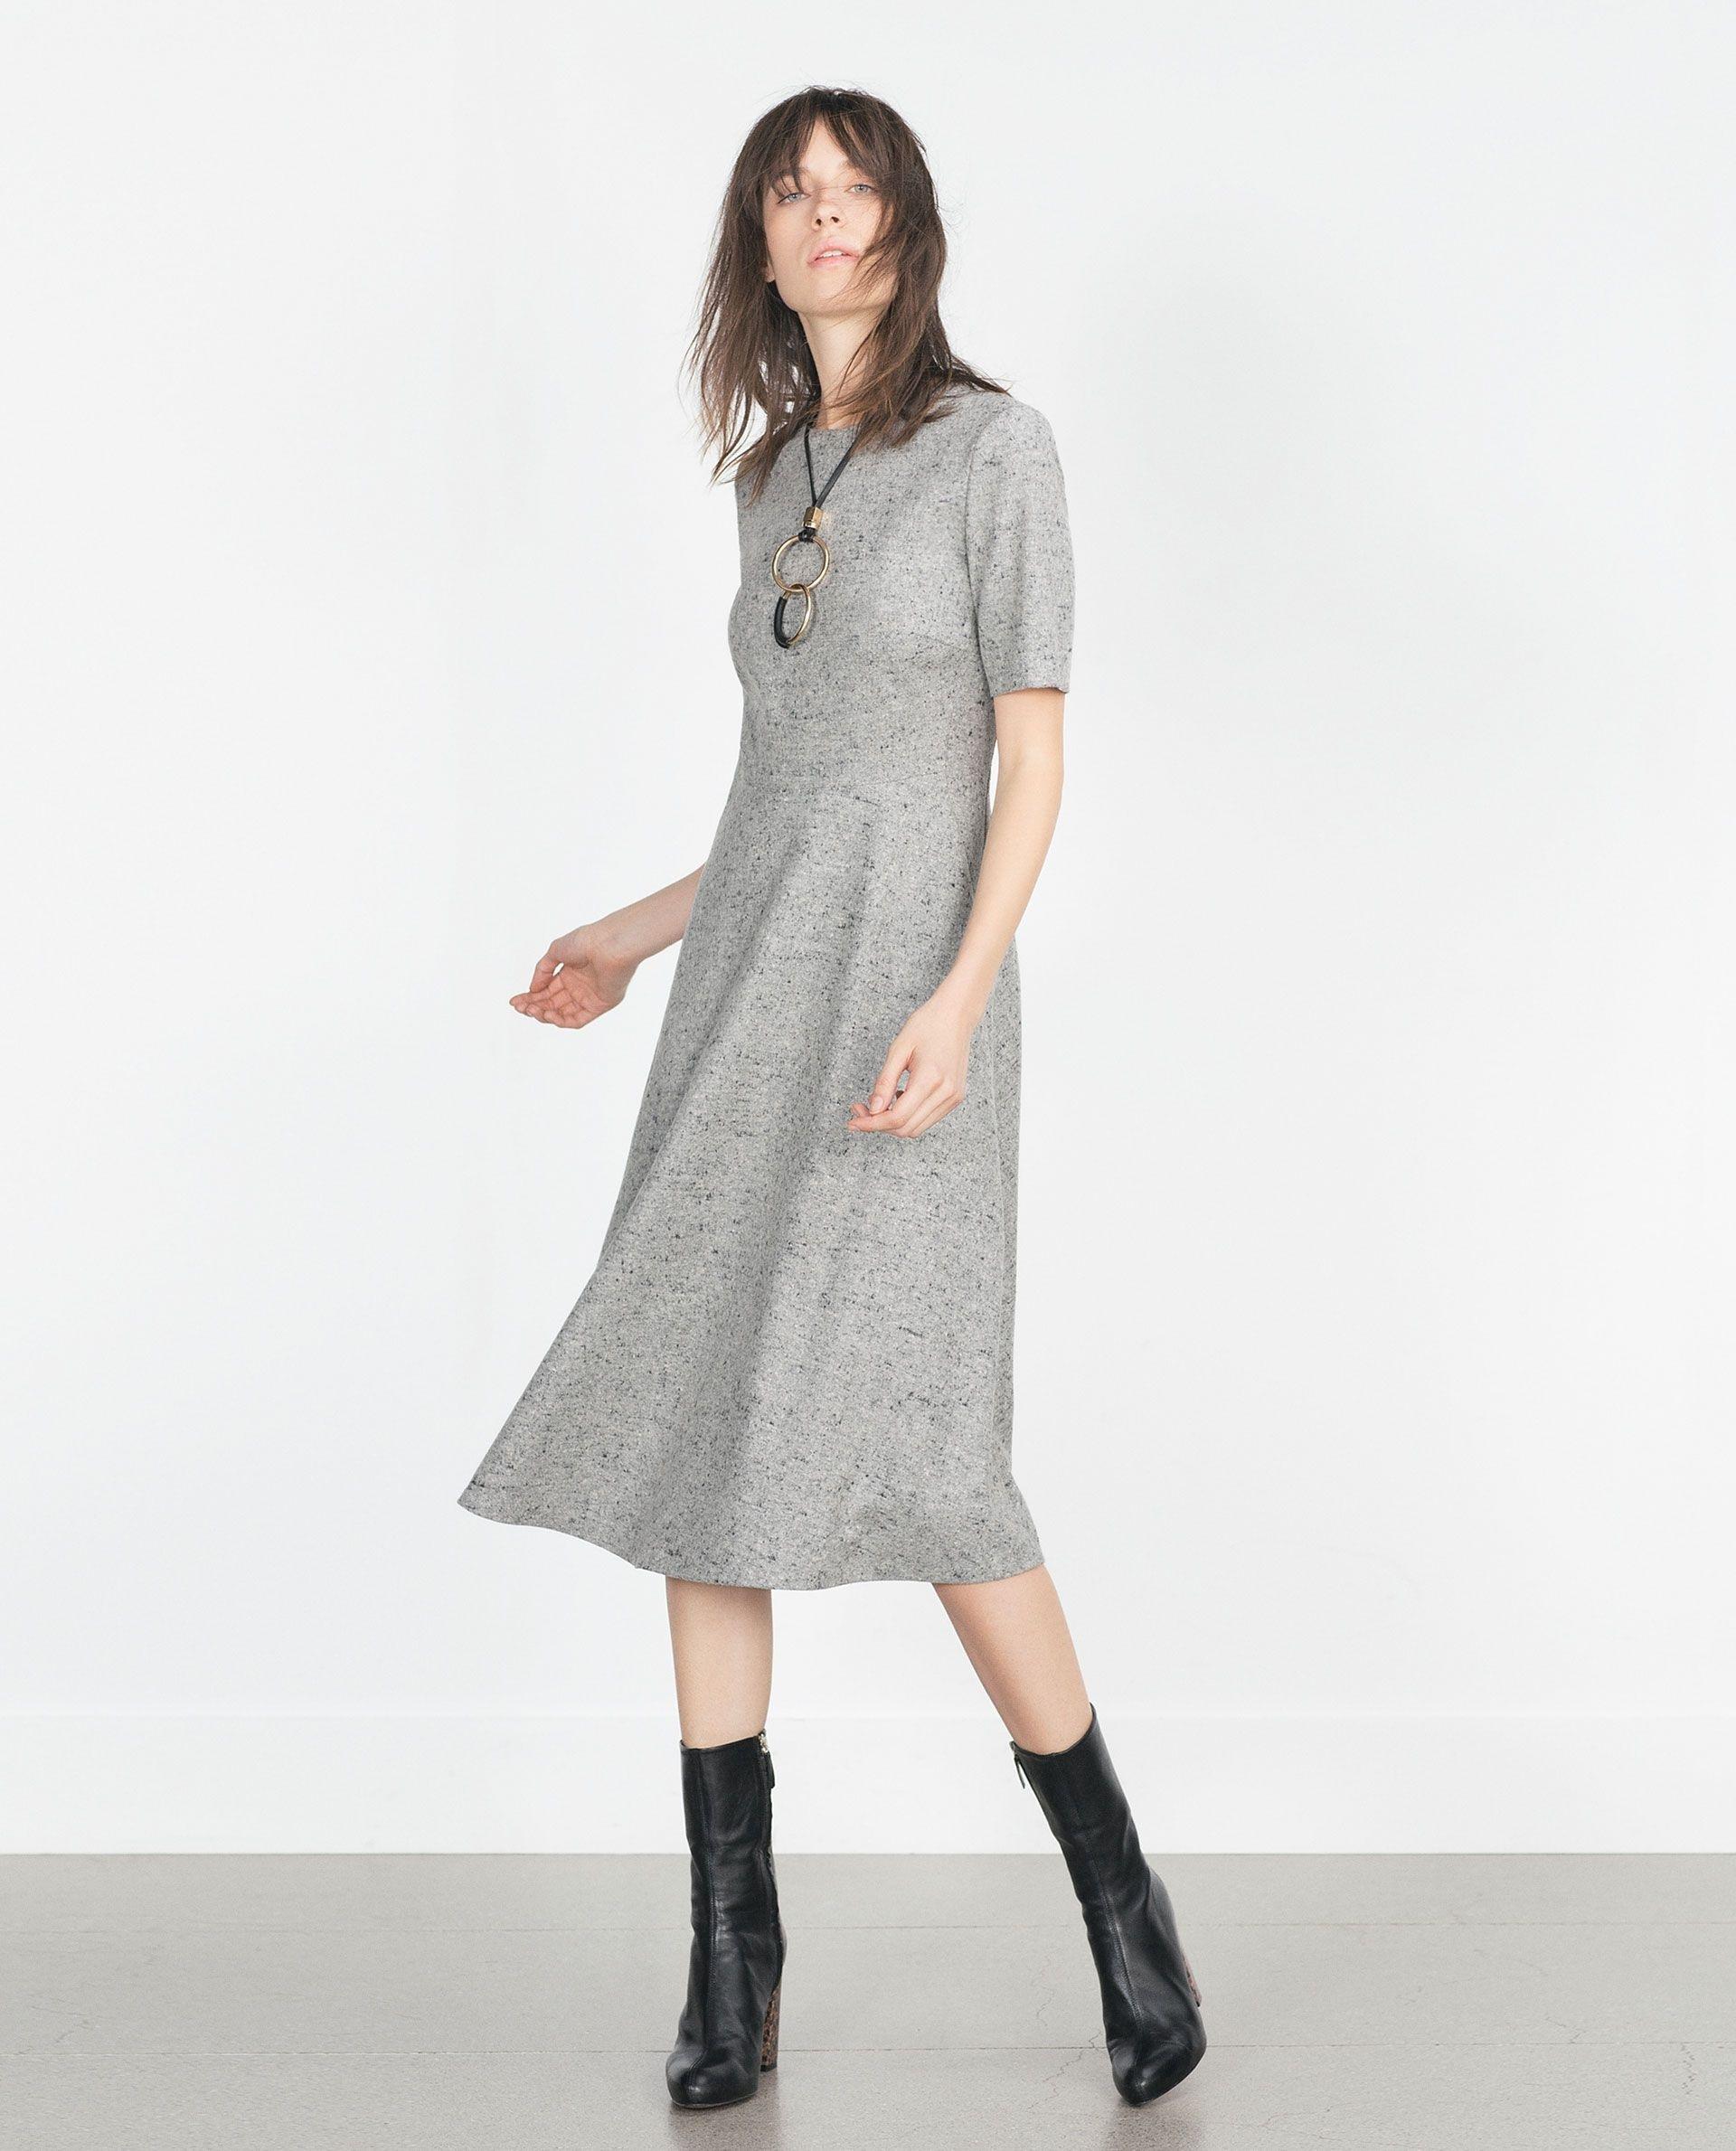 Abend Genial Kleid Mit Glockenrock Stylish15 Cool Kleid Mit Glockenrock Boutique